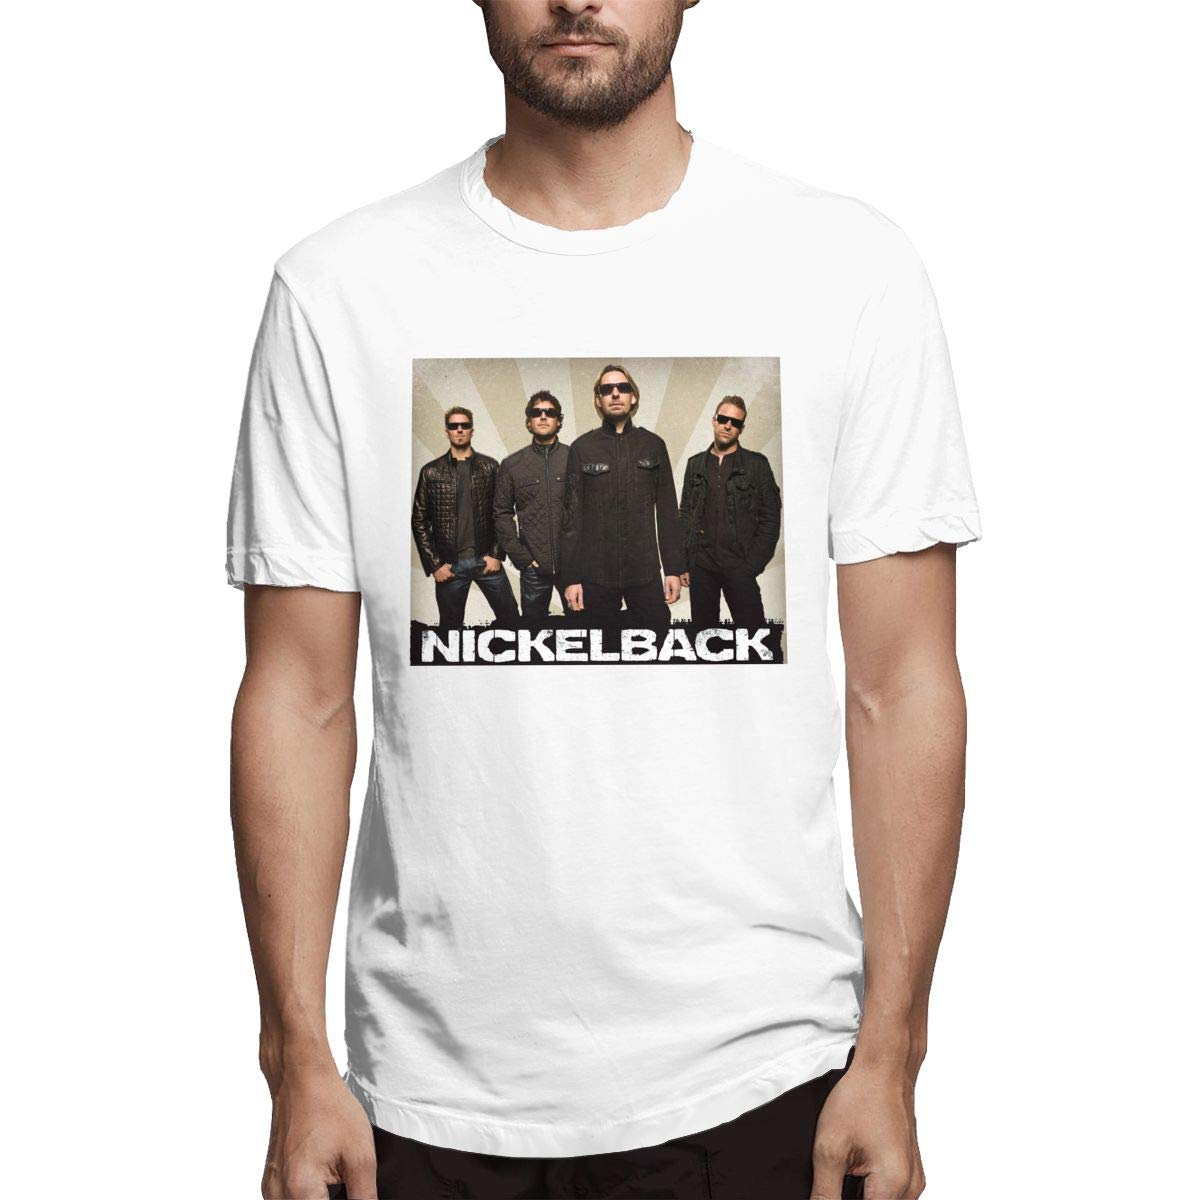 S Nickelback Ultra Soft Crew Neck Short Sleeve T Shirt For S